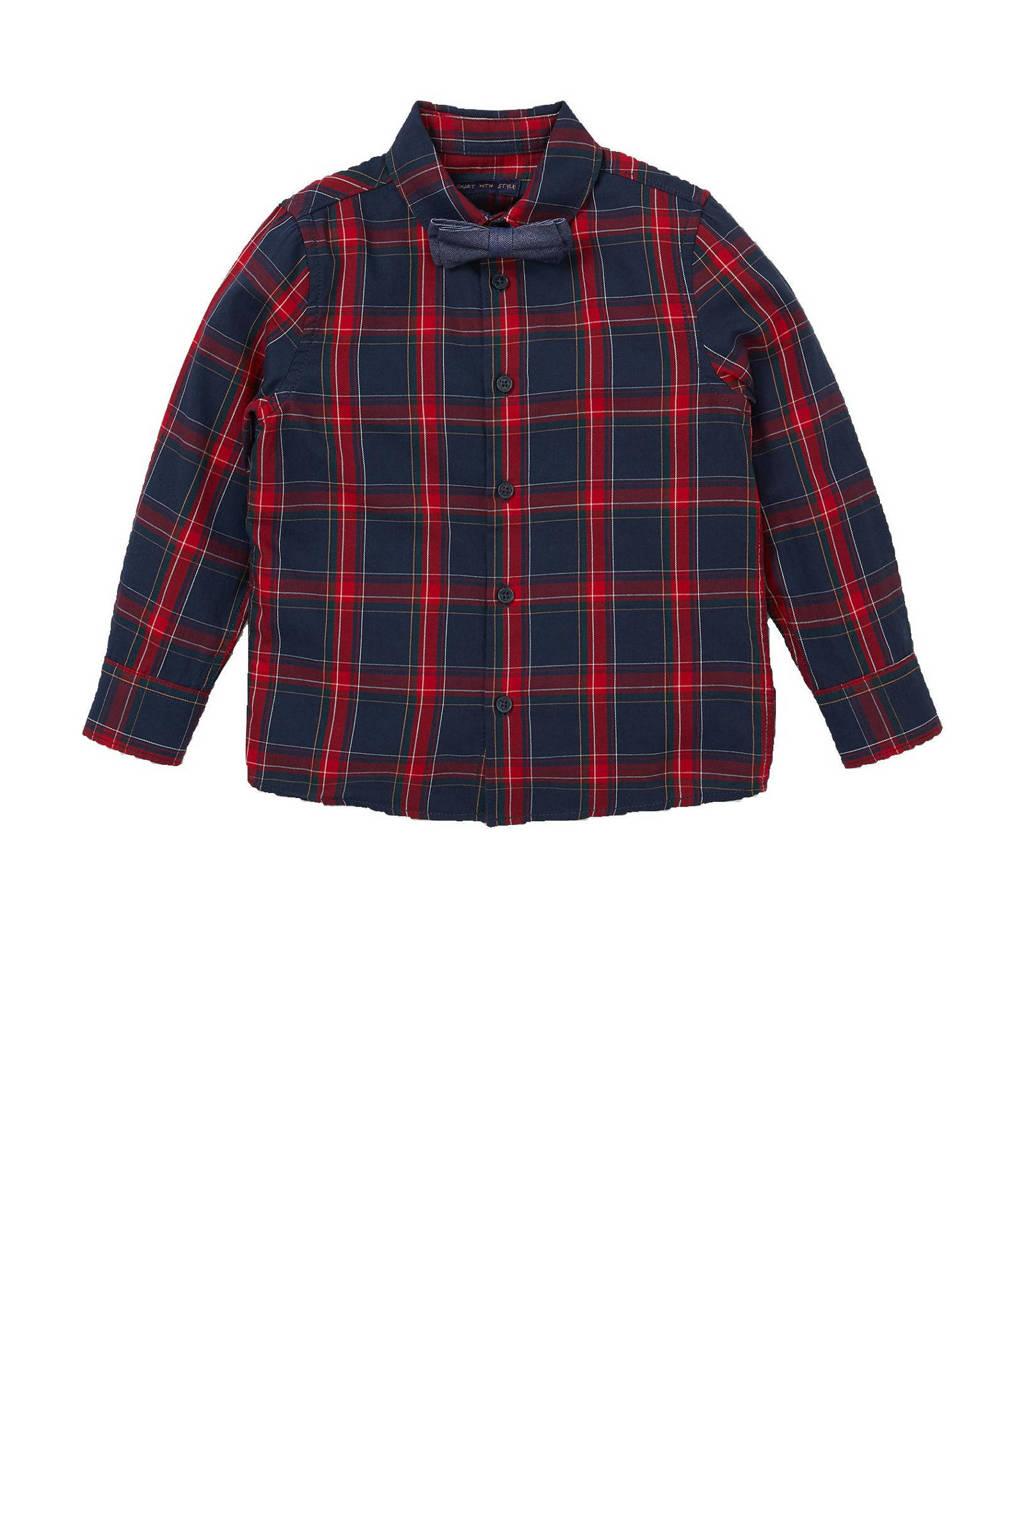 C&A Palomino geruit overhemd met verstelbare strik donkerblauw/rood, Donkerblauw/rood